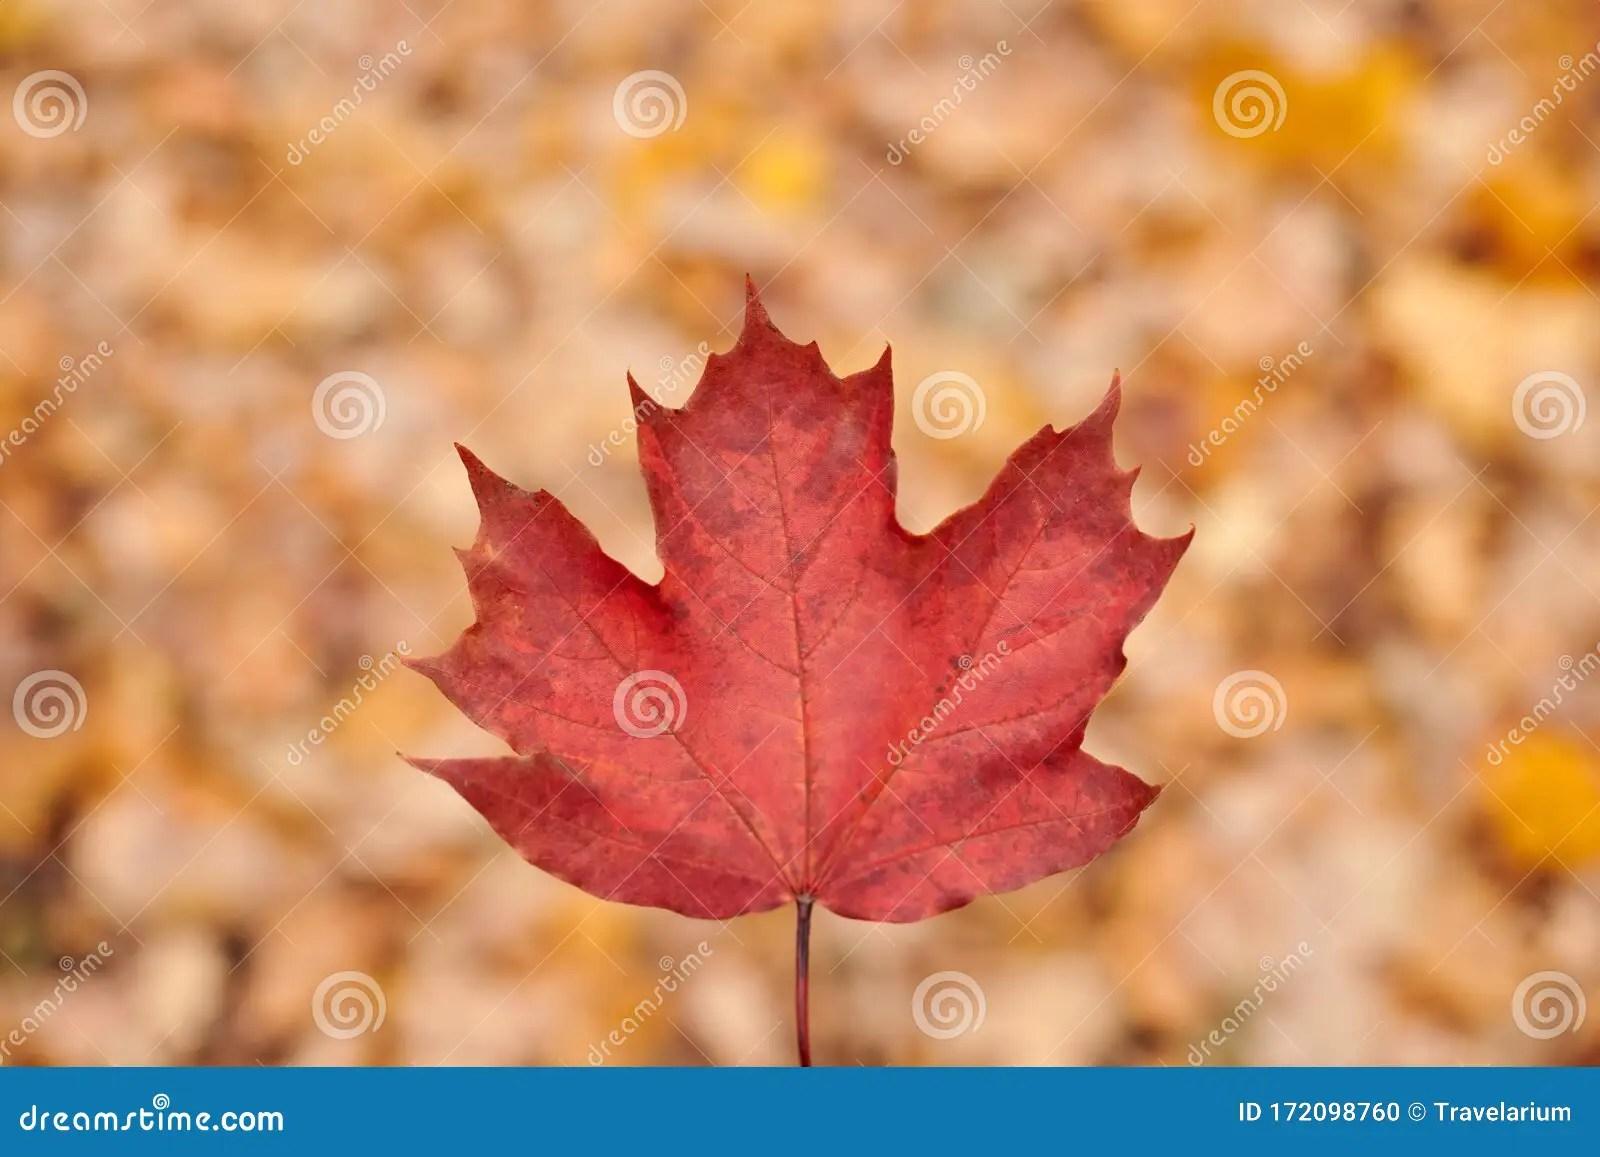 Red Autumn Leaf On Yellow Foliage Background Stock Photo